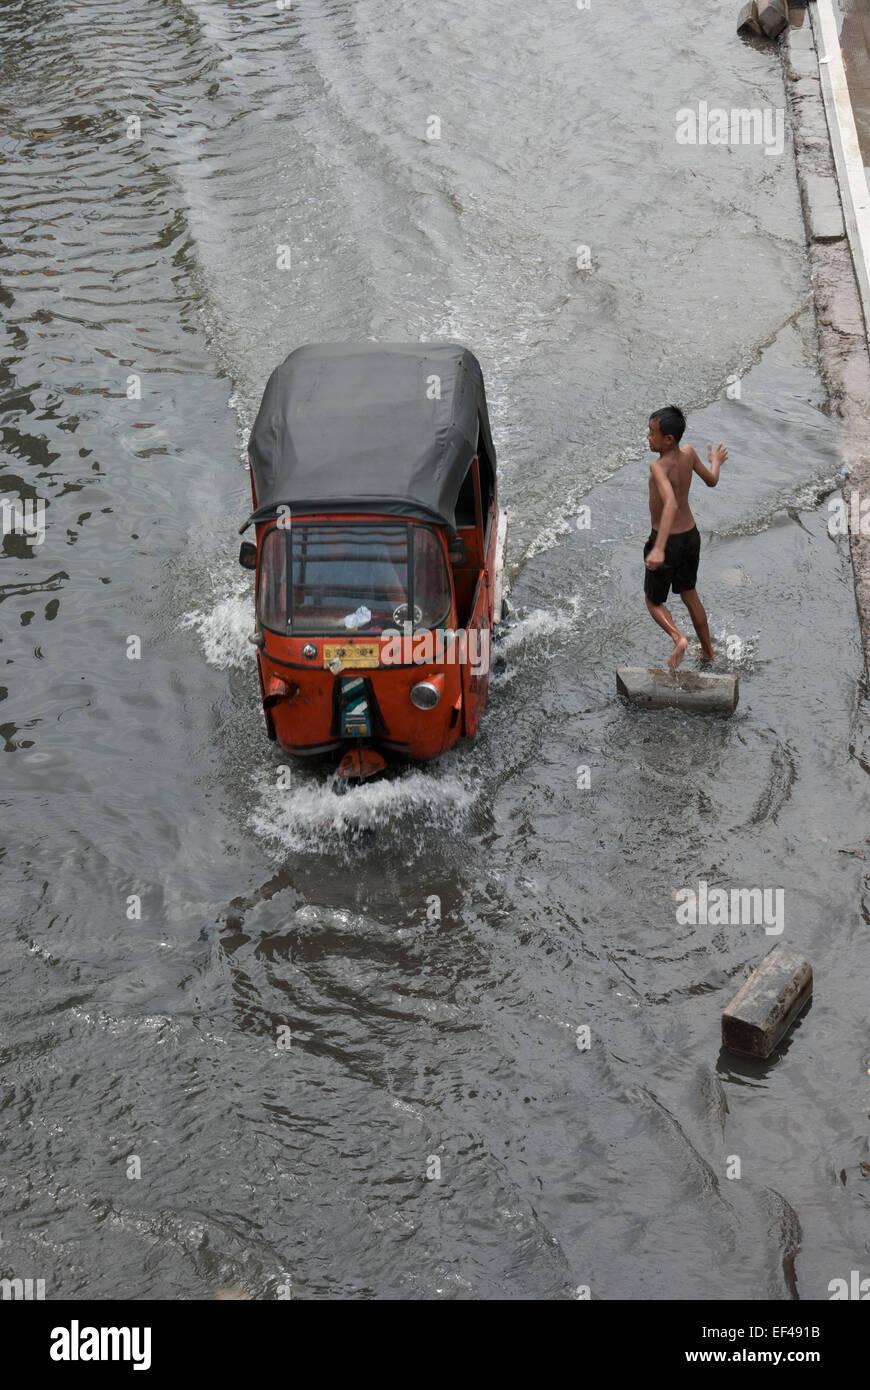 Bajaj auto rickshaw passes through flooded street in Jakarta. Stock Photo